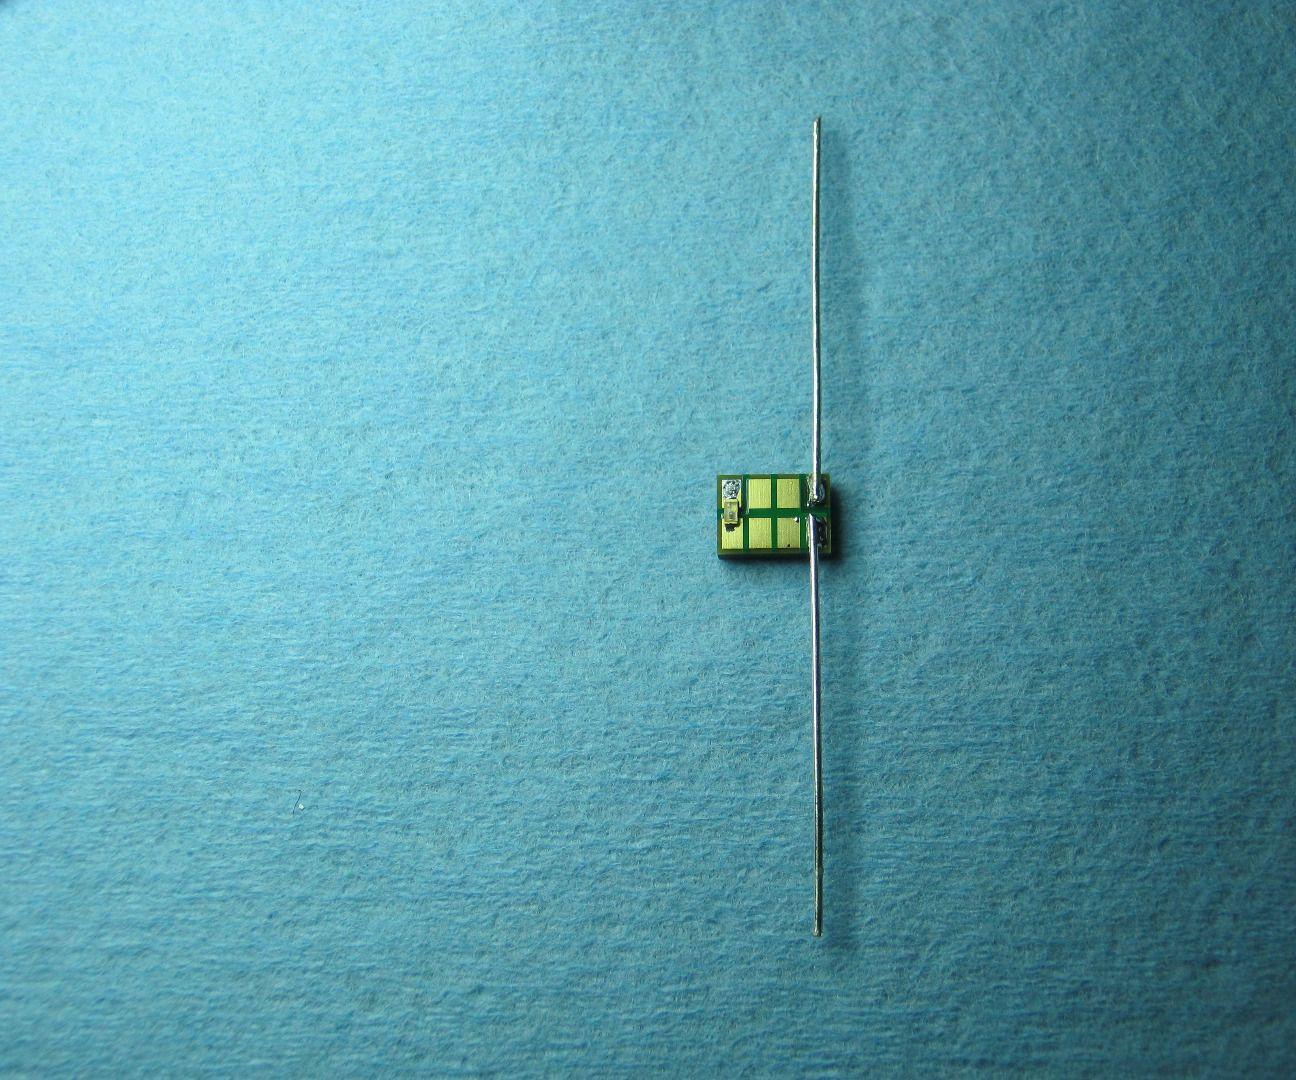 Microwave Energy Detector & Wireless Energy Harvesting | creative ...